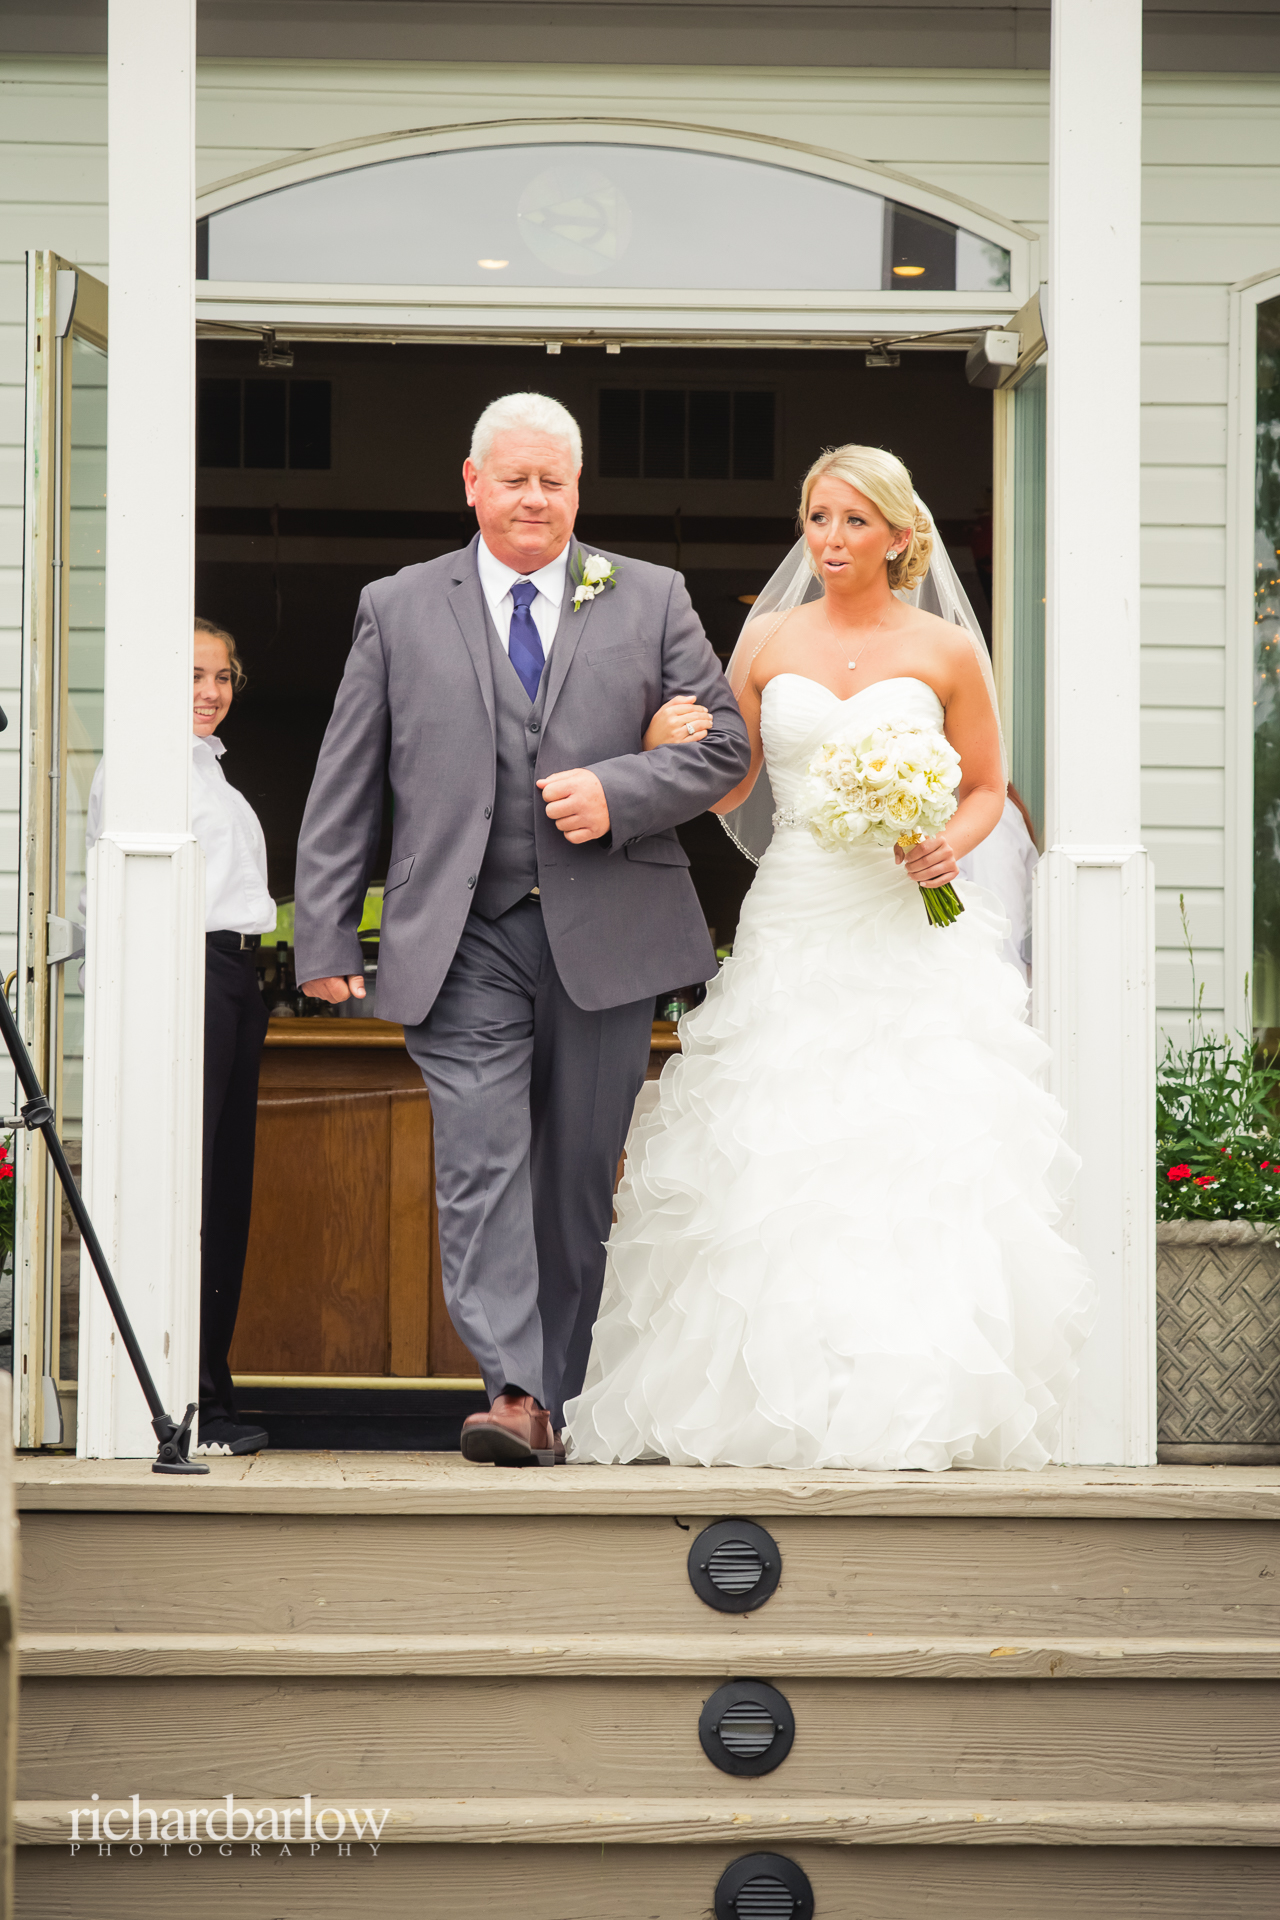 Might-Toland Wedding-342.jpg